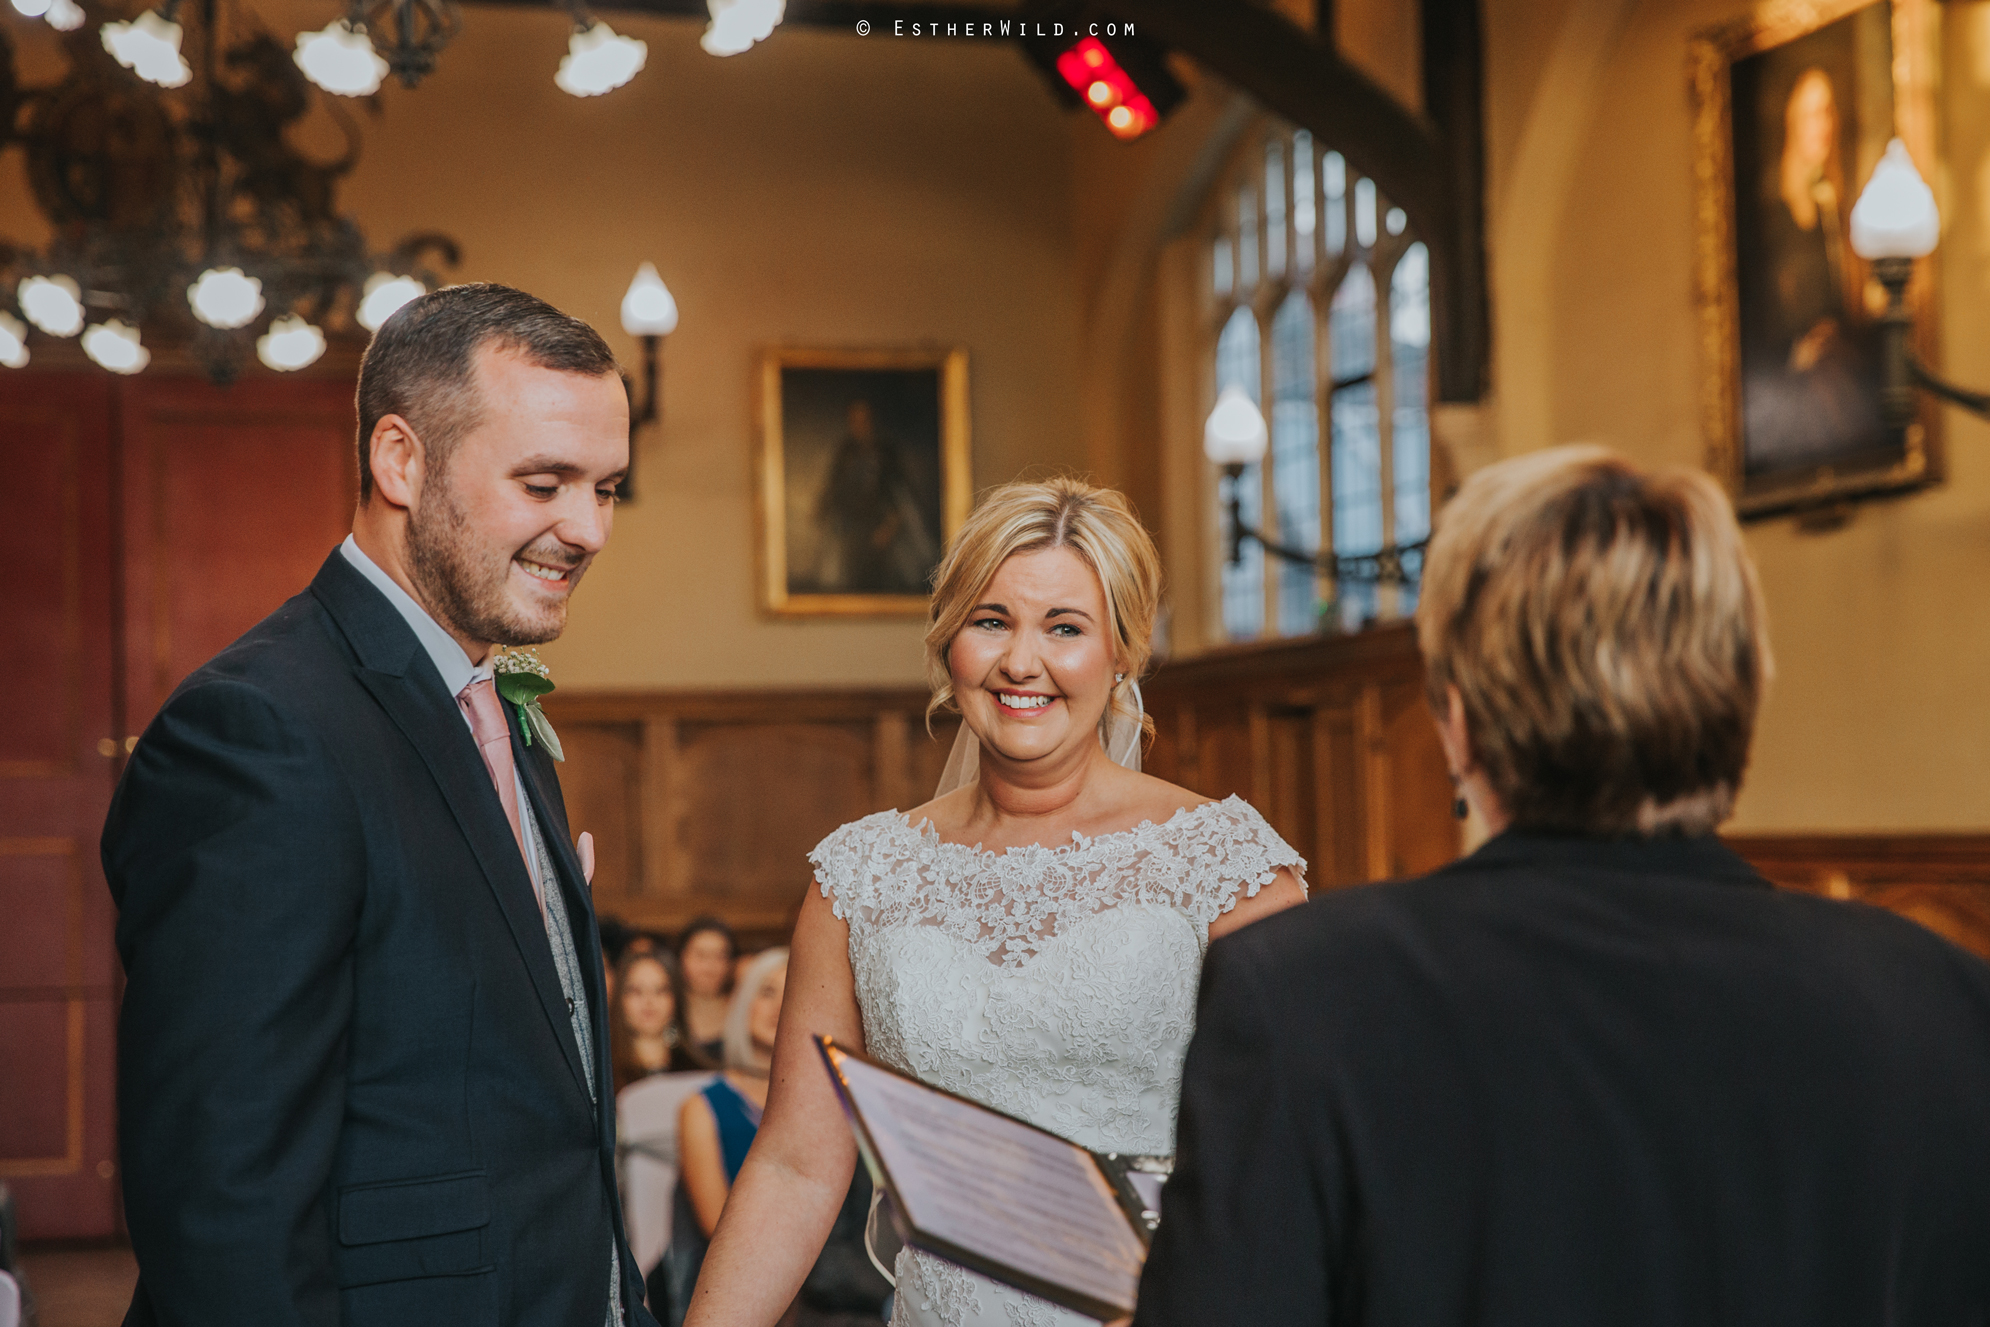 Wedding_Kings_Lynn_Town_Hall_Norfolk_Photographer_Esther_Wild_IMG_0985.jpg